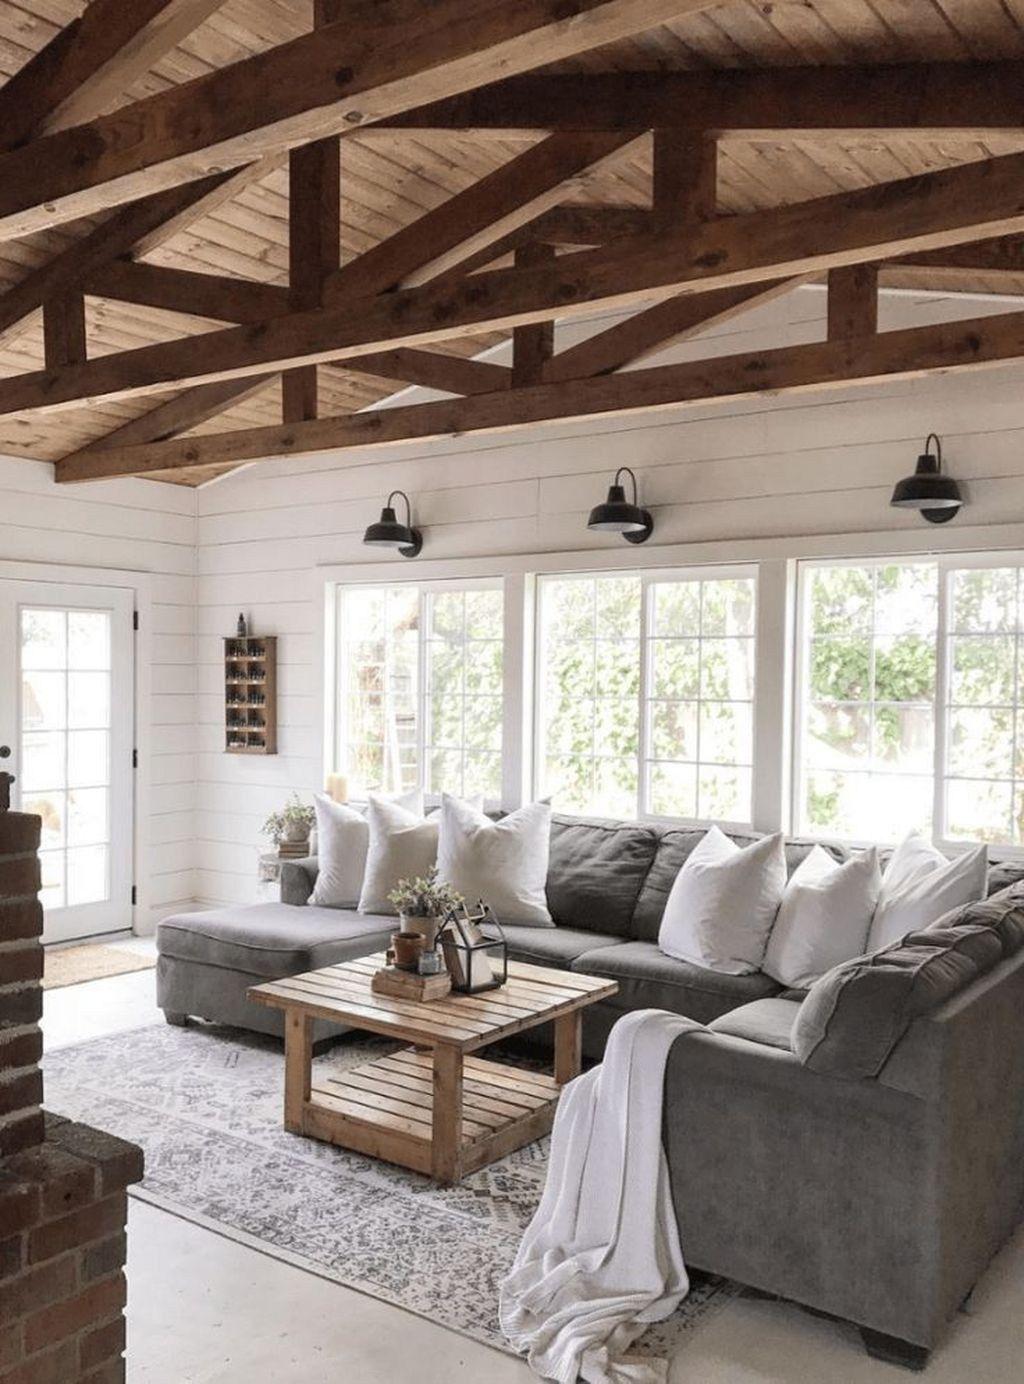 Get Home Design Ideas: The Best Rustic Living Room Decor Ideas 15